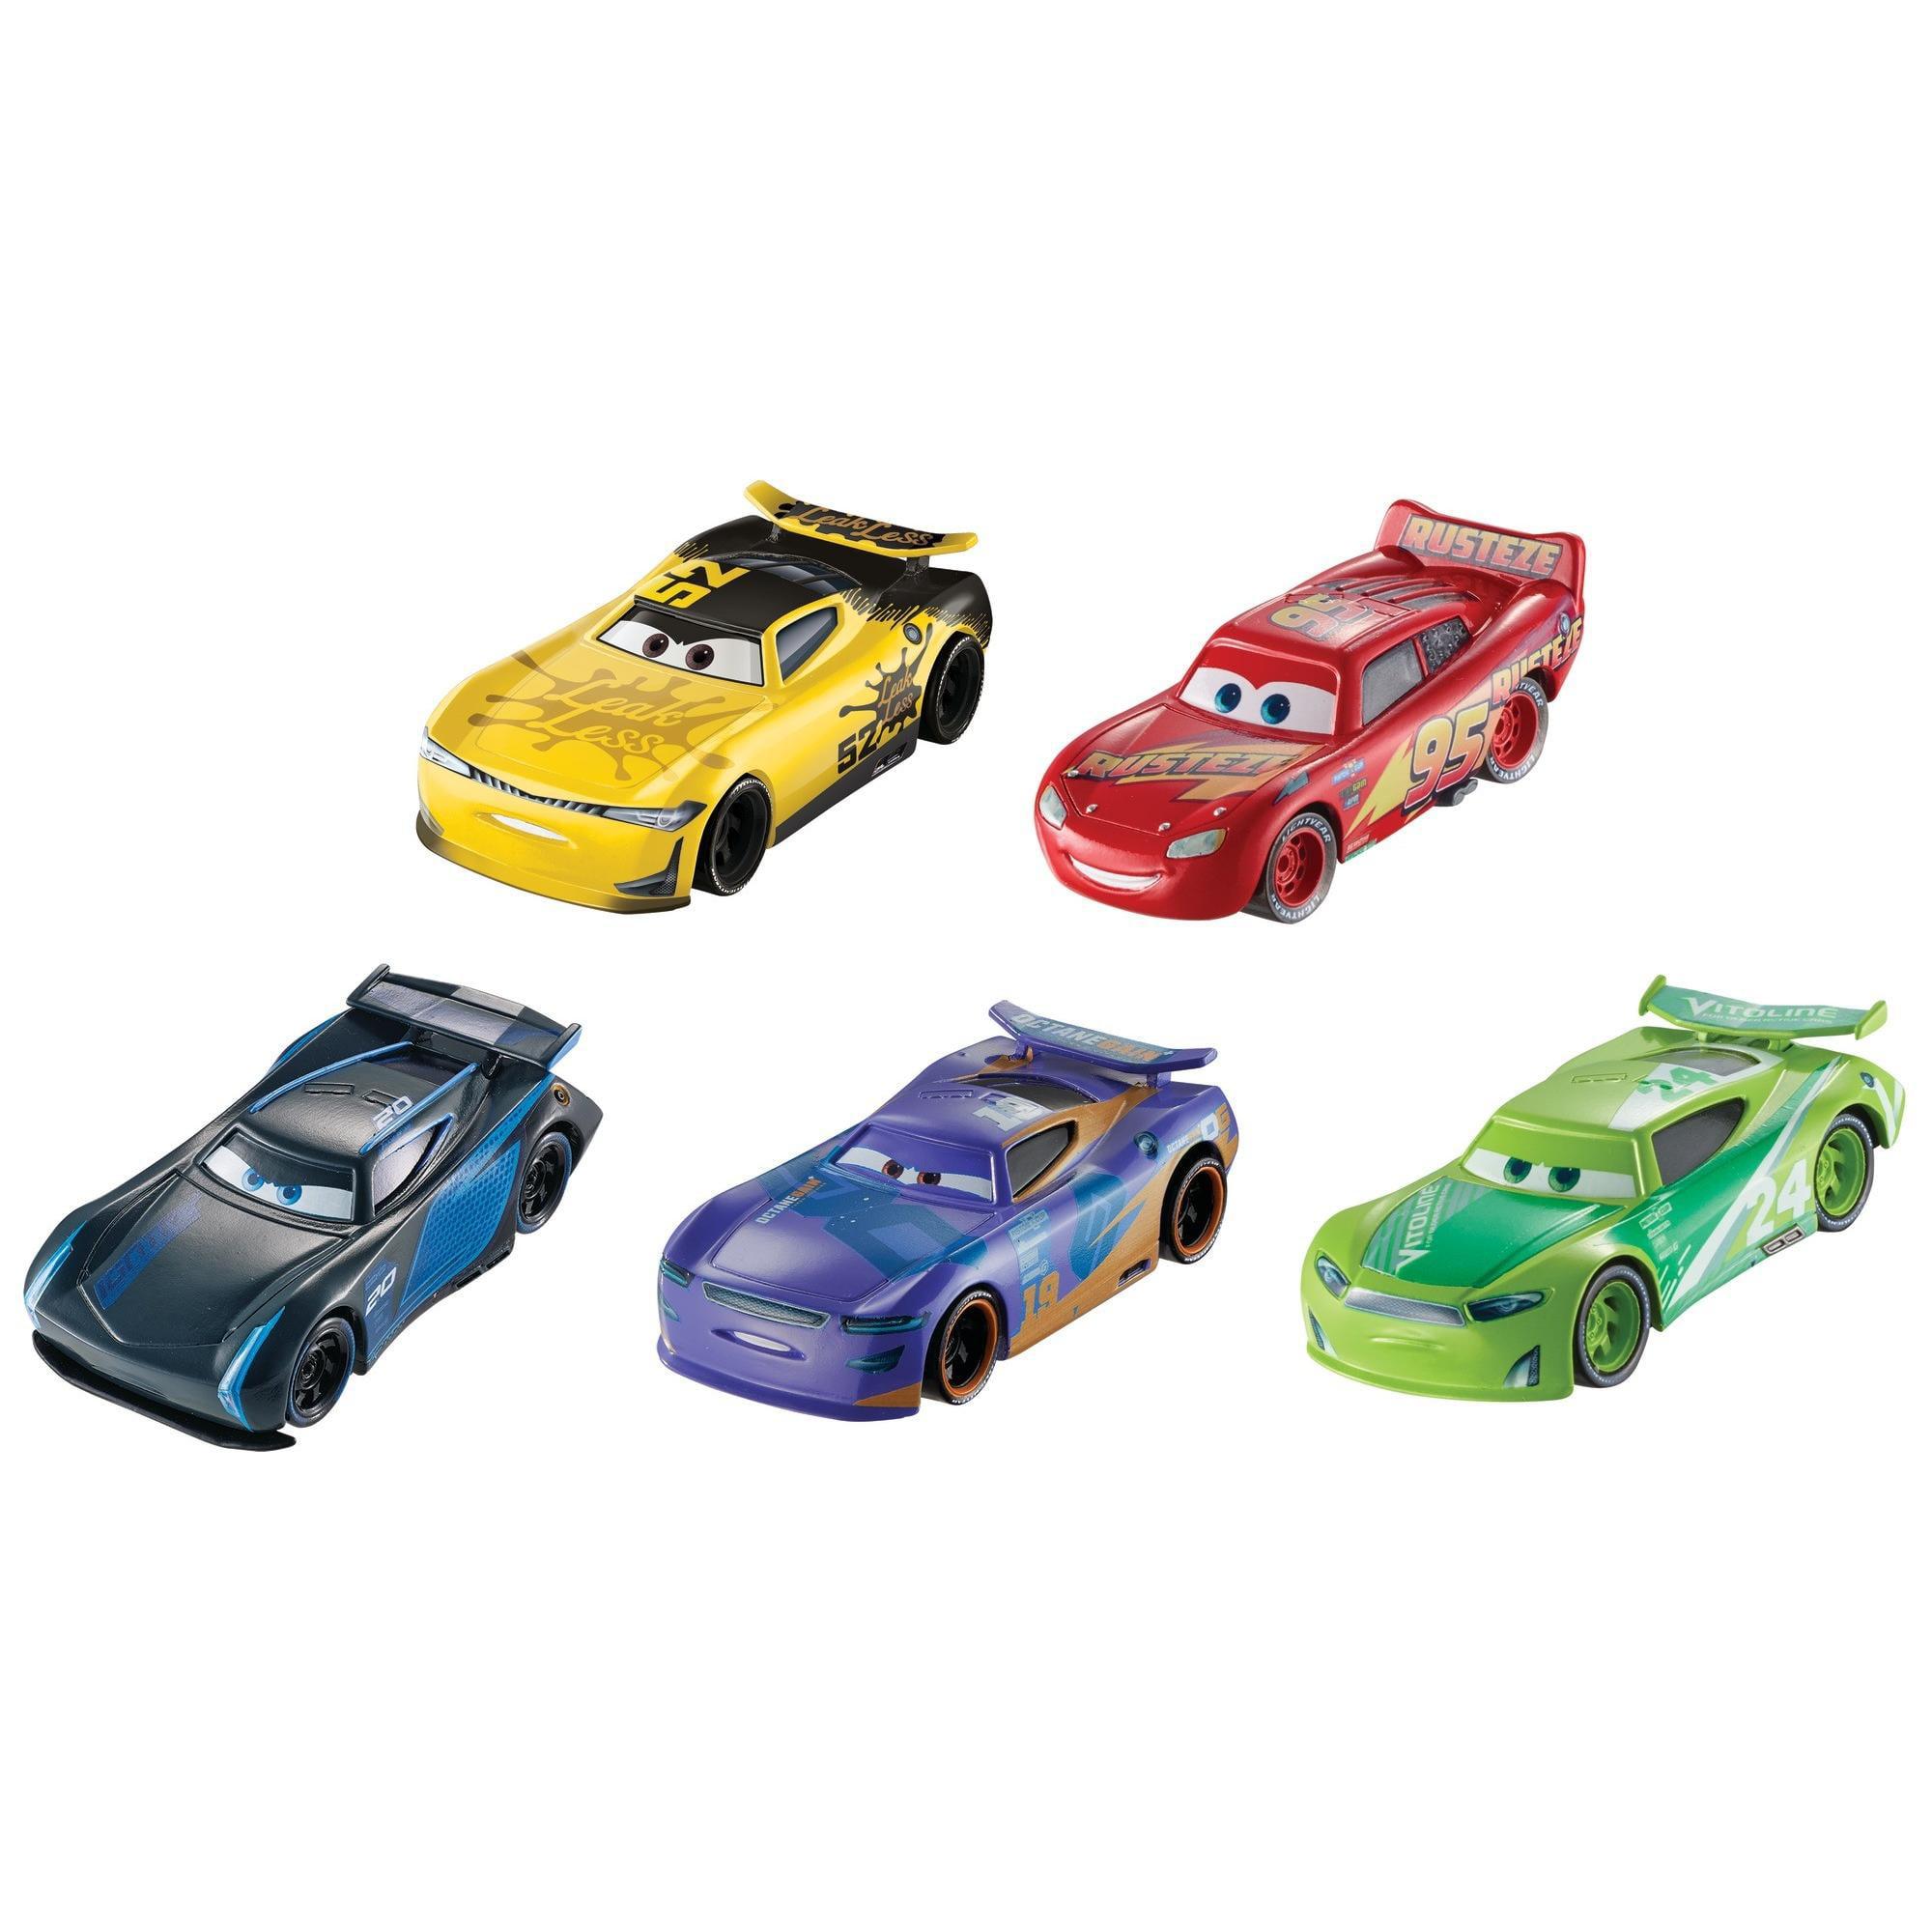 Disney Pixar Cars 3 Vehicle 5 Pack Styles May Vary Walmart Com